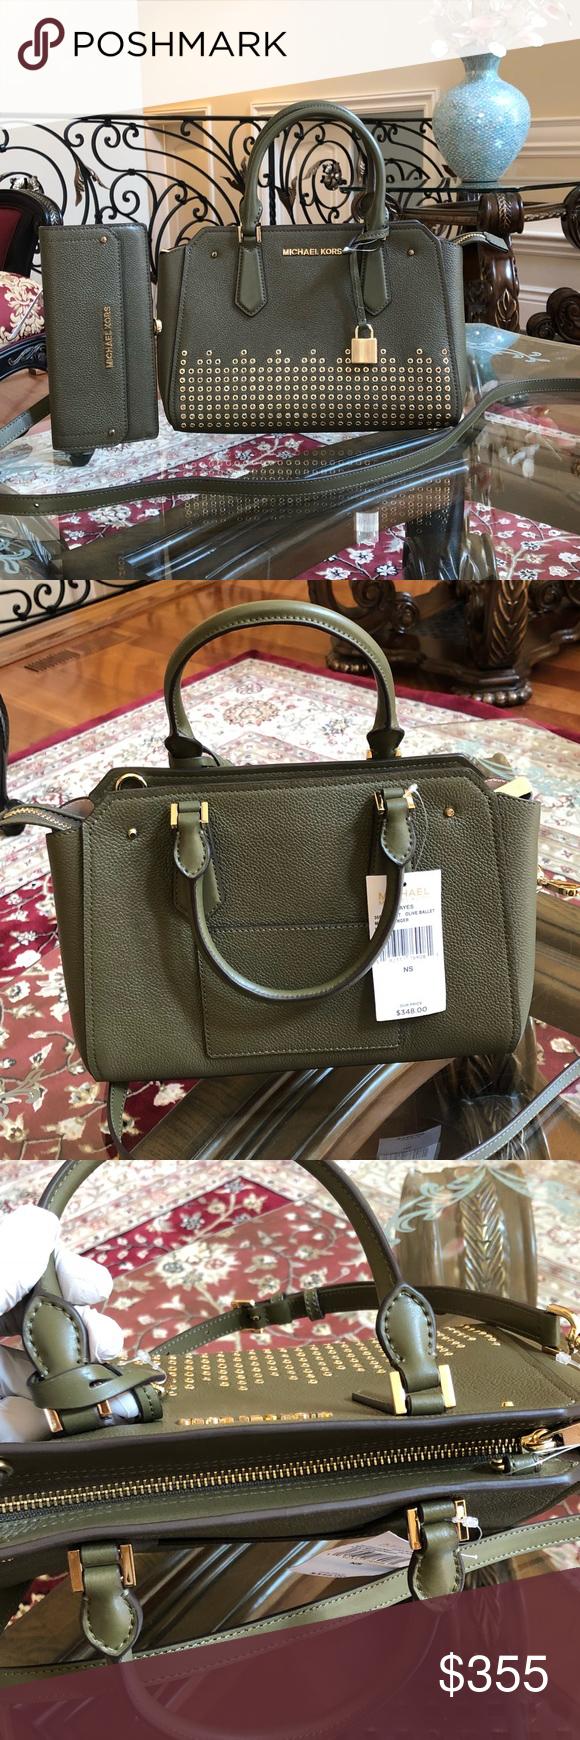 f999e5bfe87c Authentic Michael Kors Hayes medium handbag amp wallet Guaranteed Authentic Bundled  2PCS Handbag+Wallet set